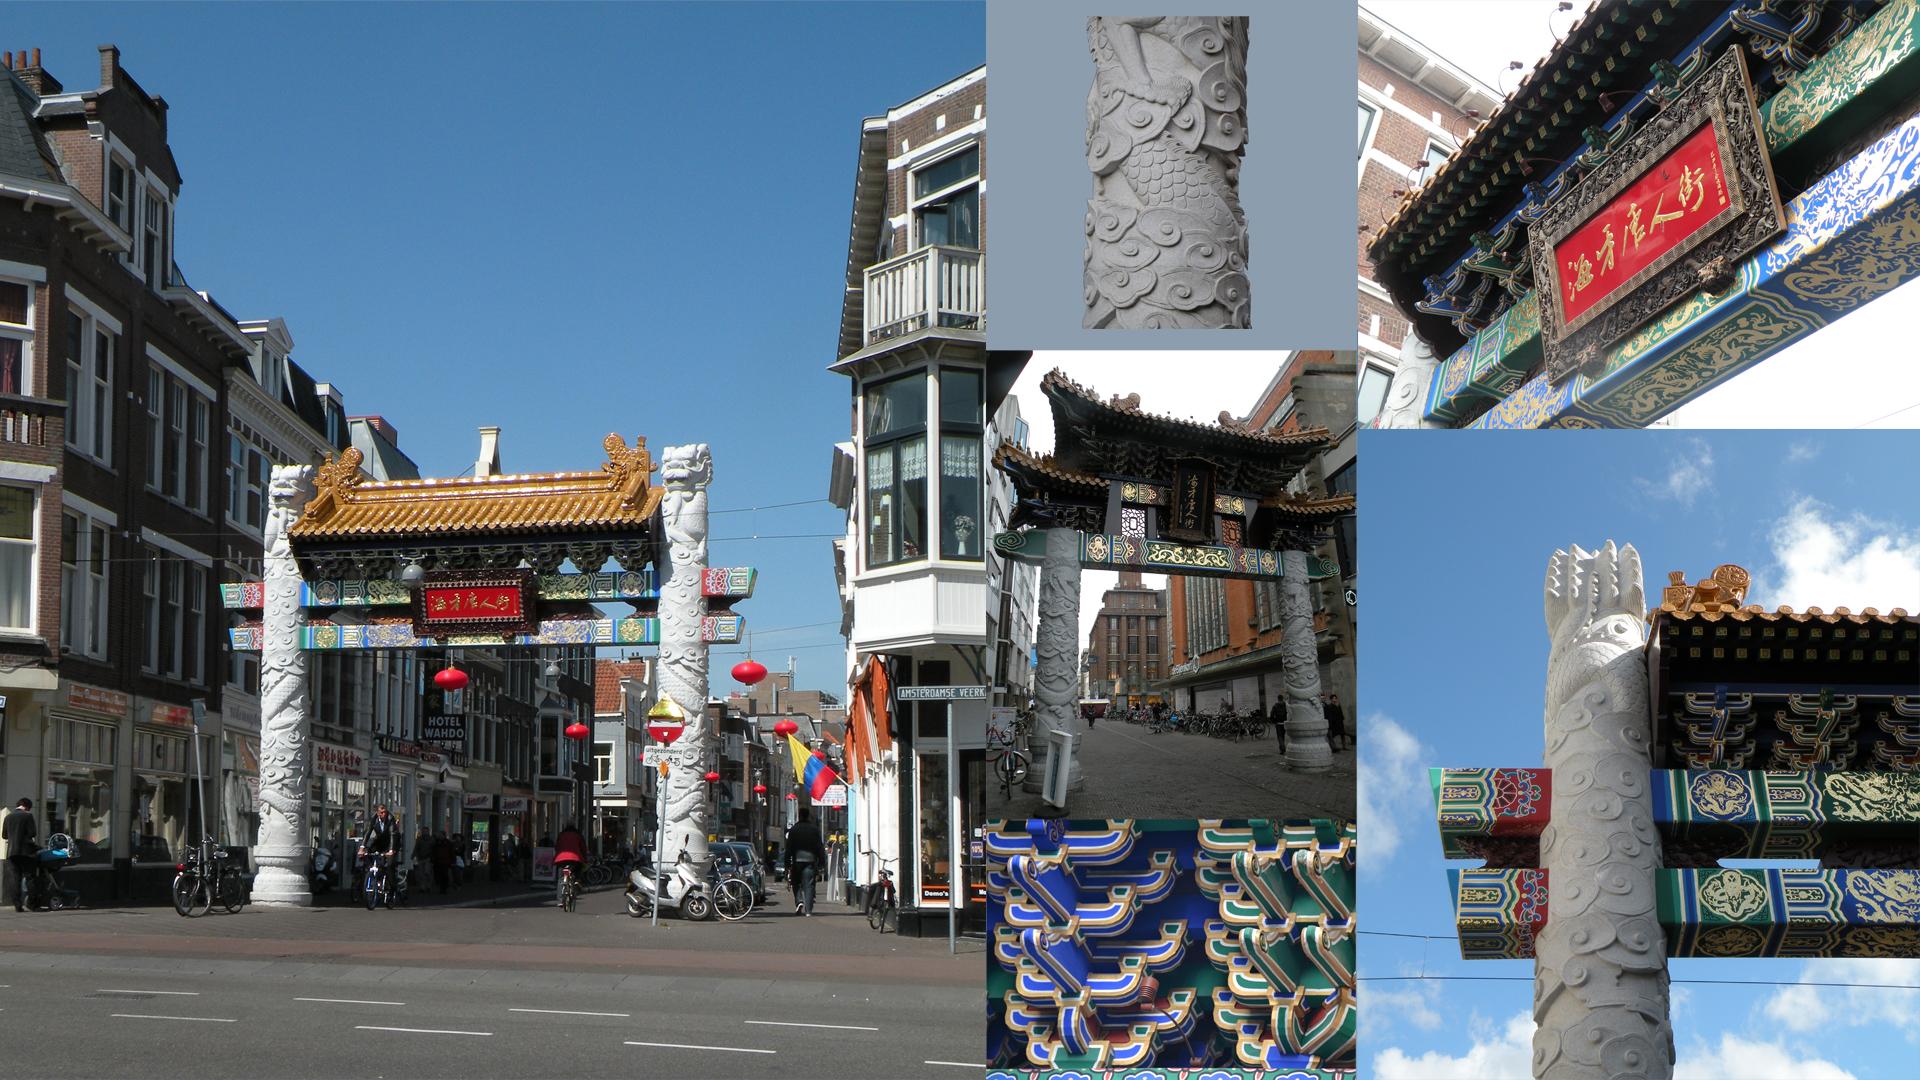 Chinatown poort def 14